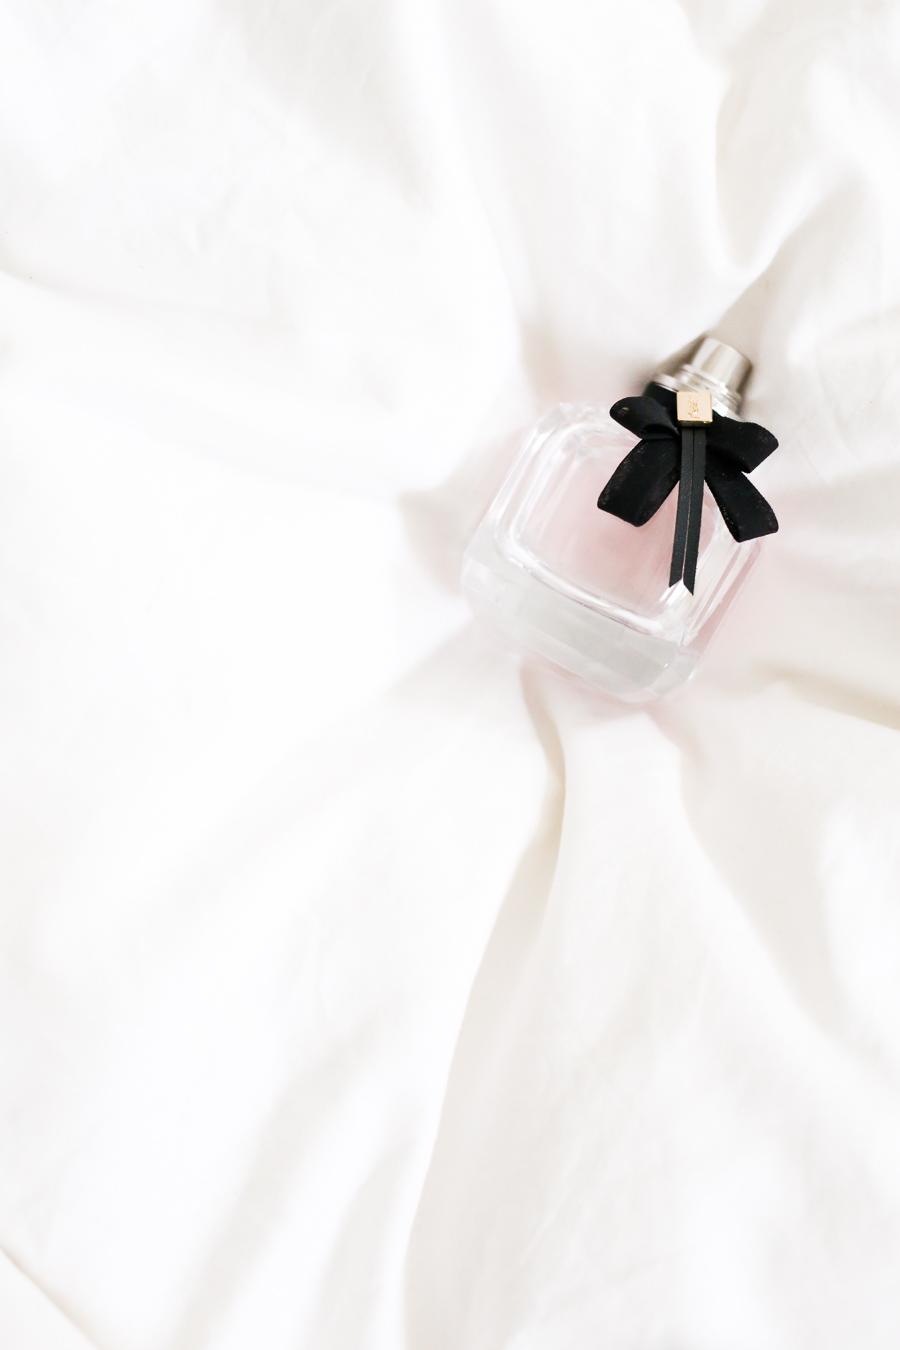 YSL-Perfume